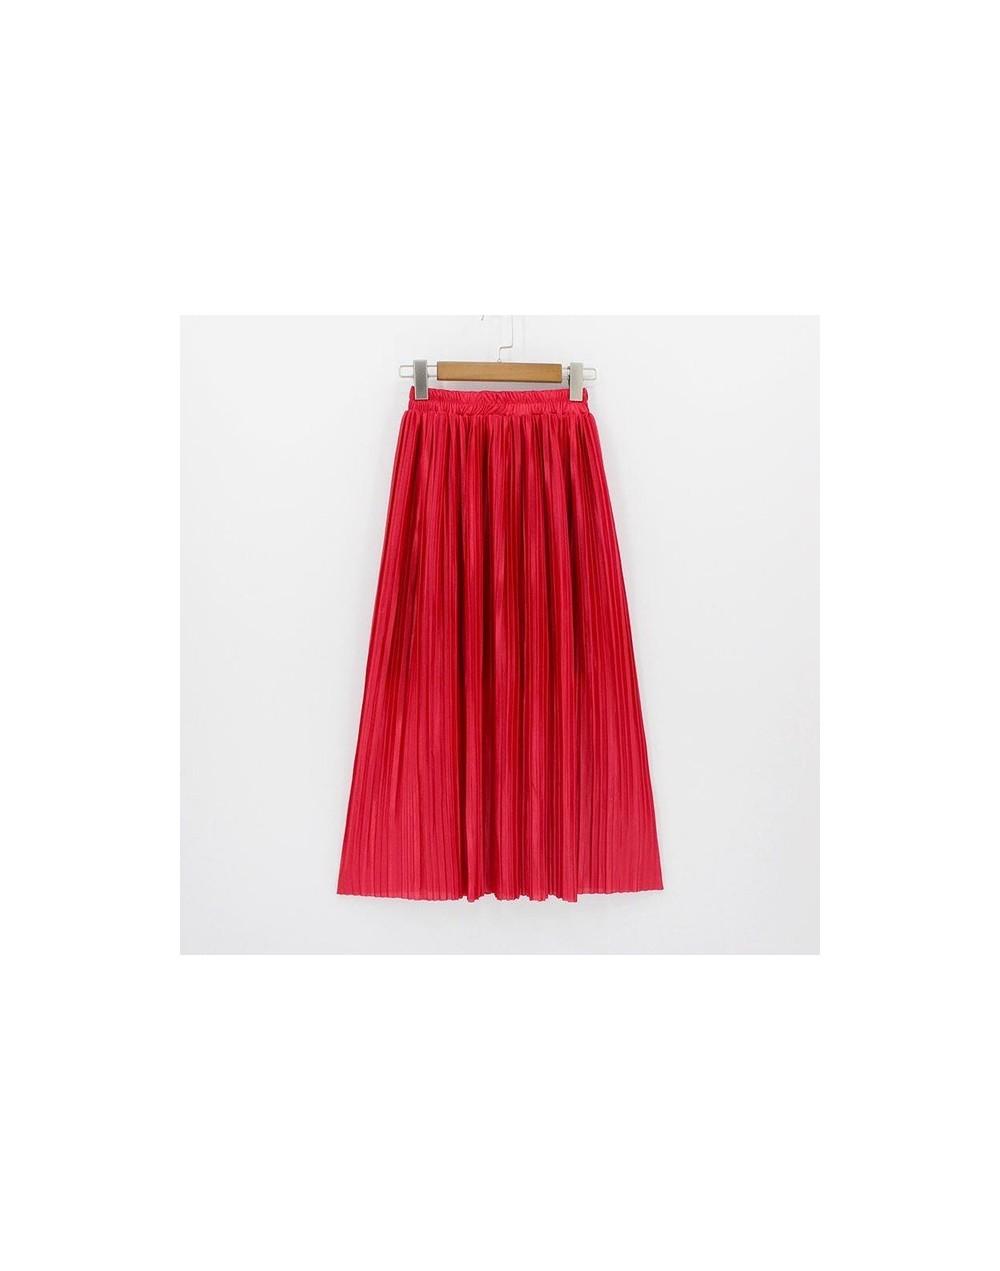 2018 New Women Fashion Long Skirts High Waist Pleated Maxi Skirt Bling Metallic Silk Tutu Skirt - red - 413901459385-13